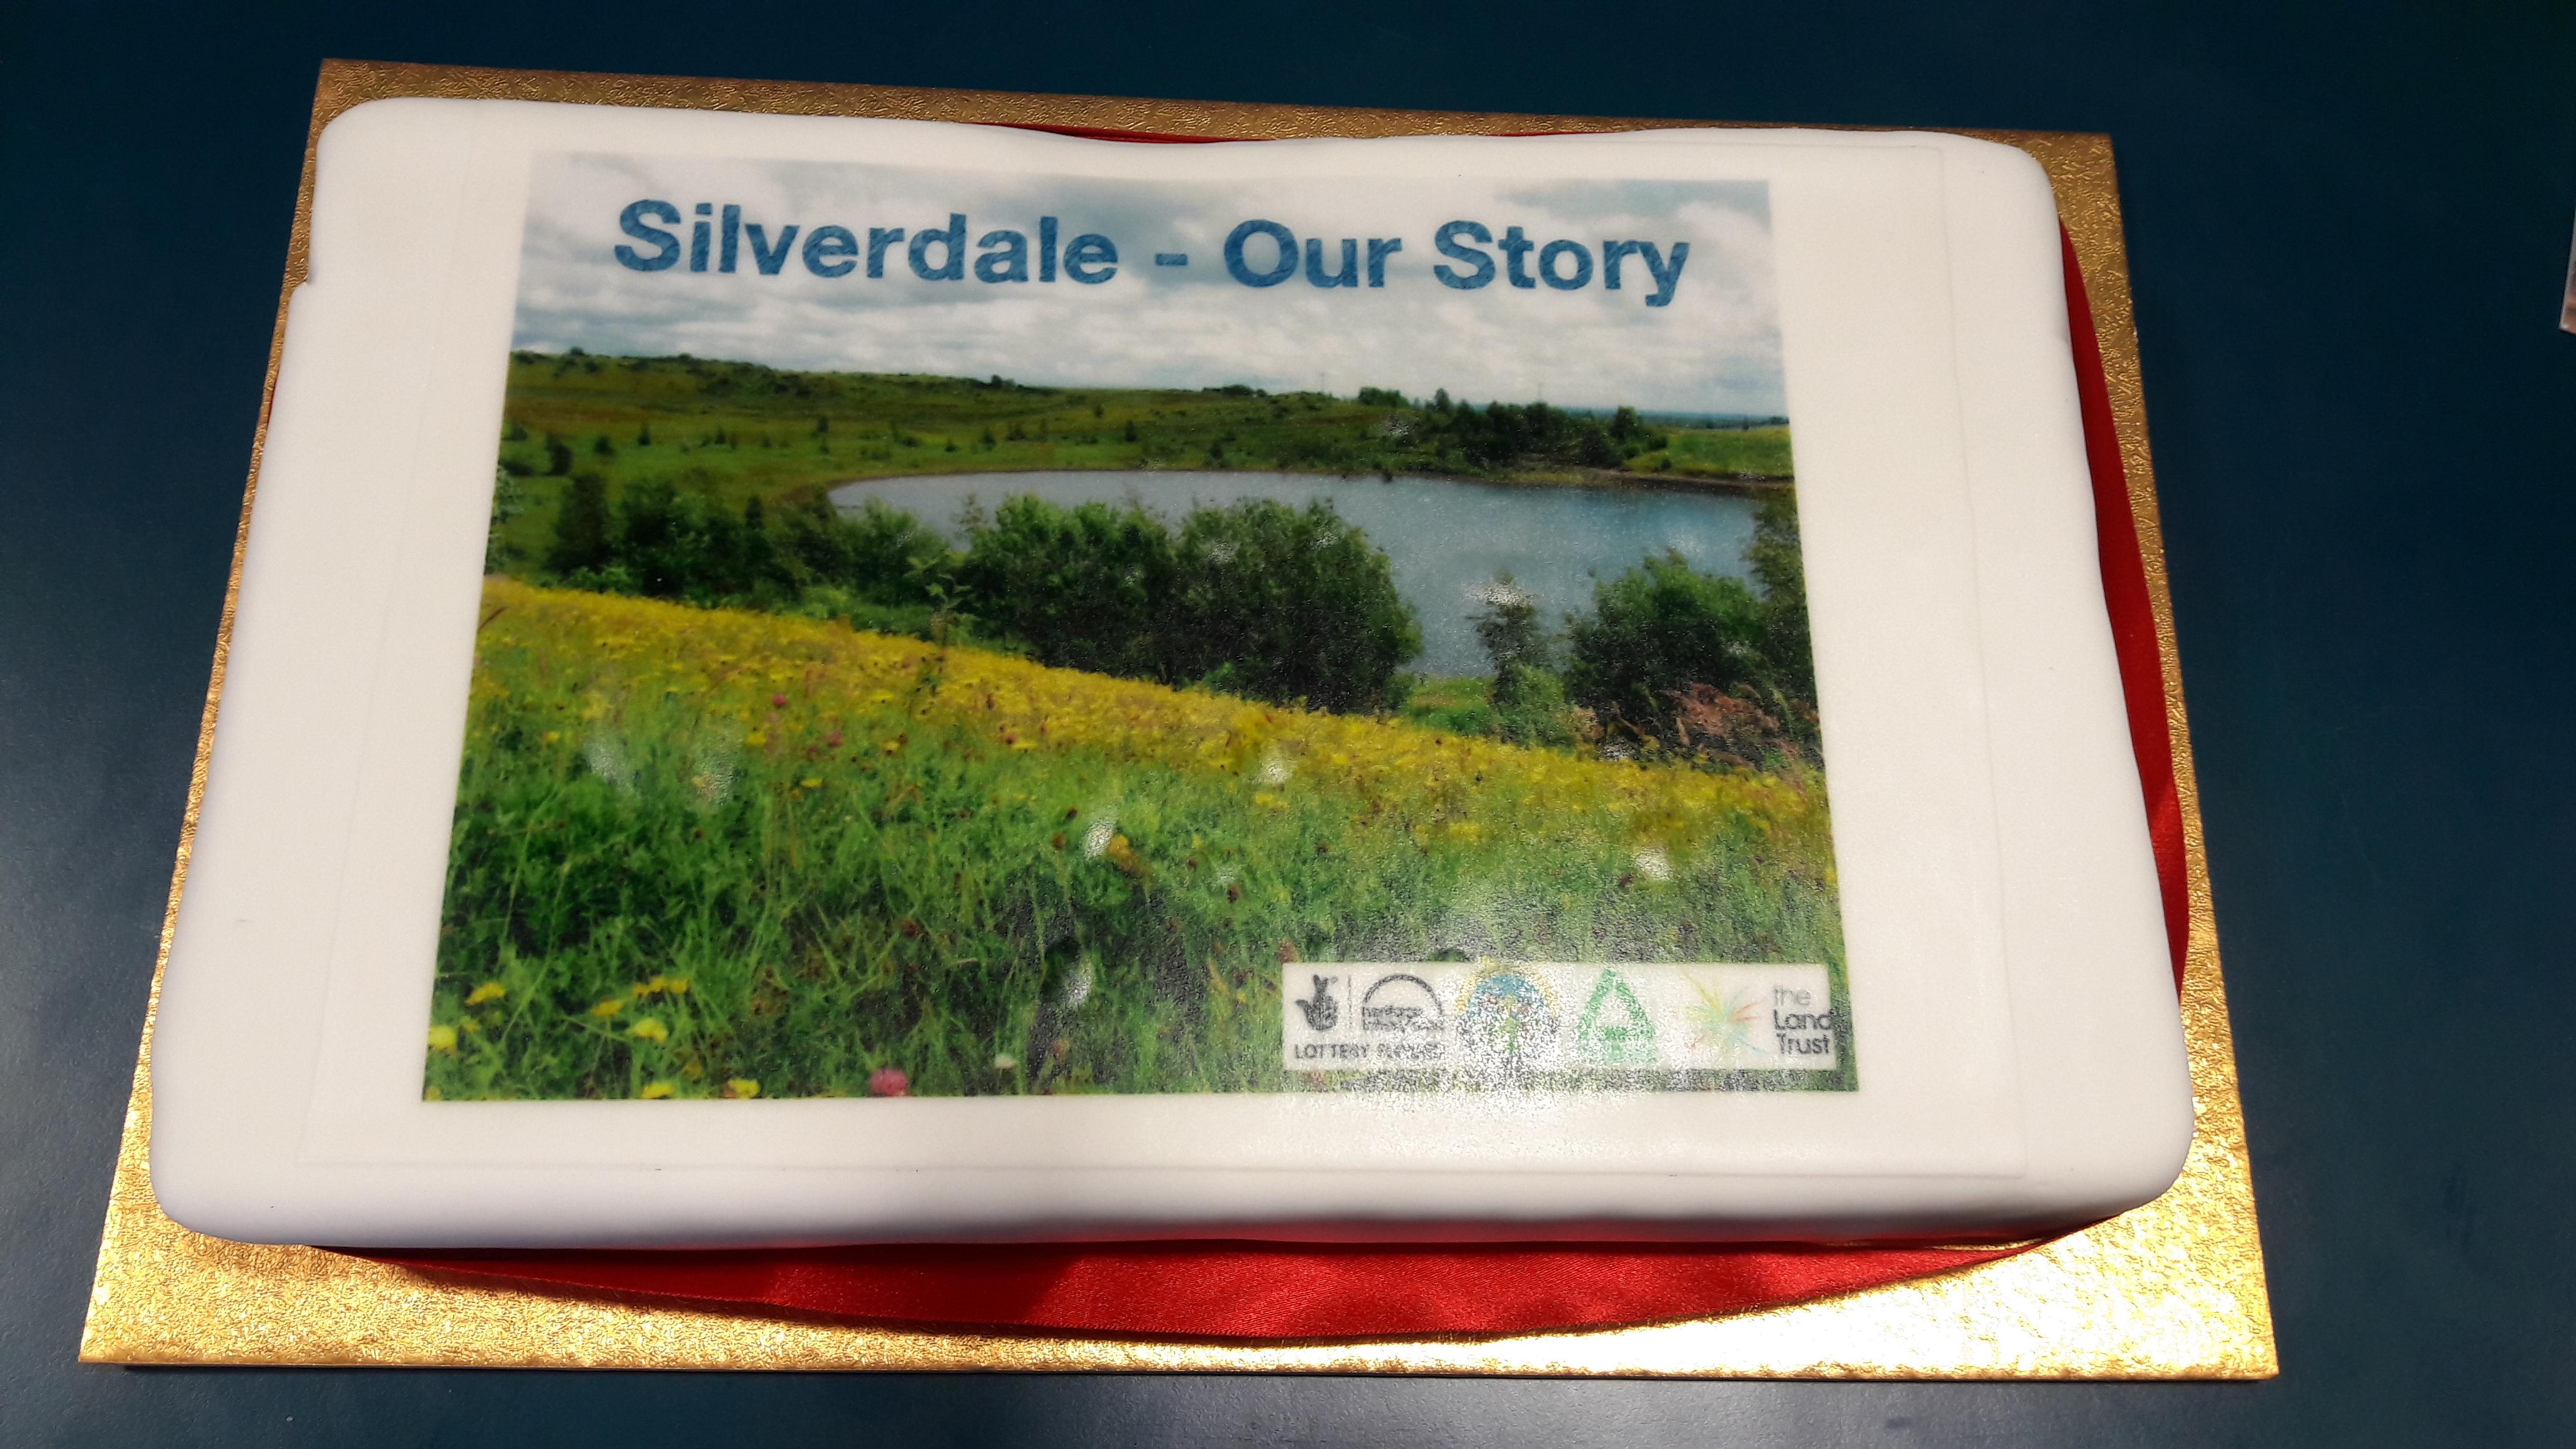 Silverdale Our Story celebration cake